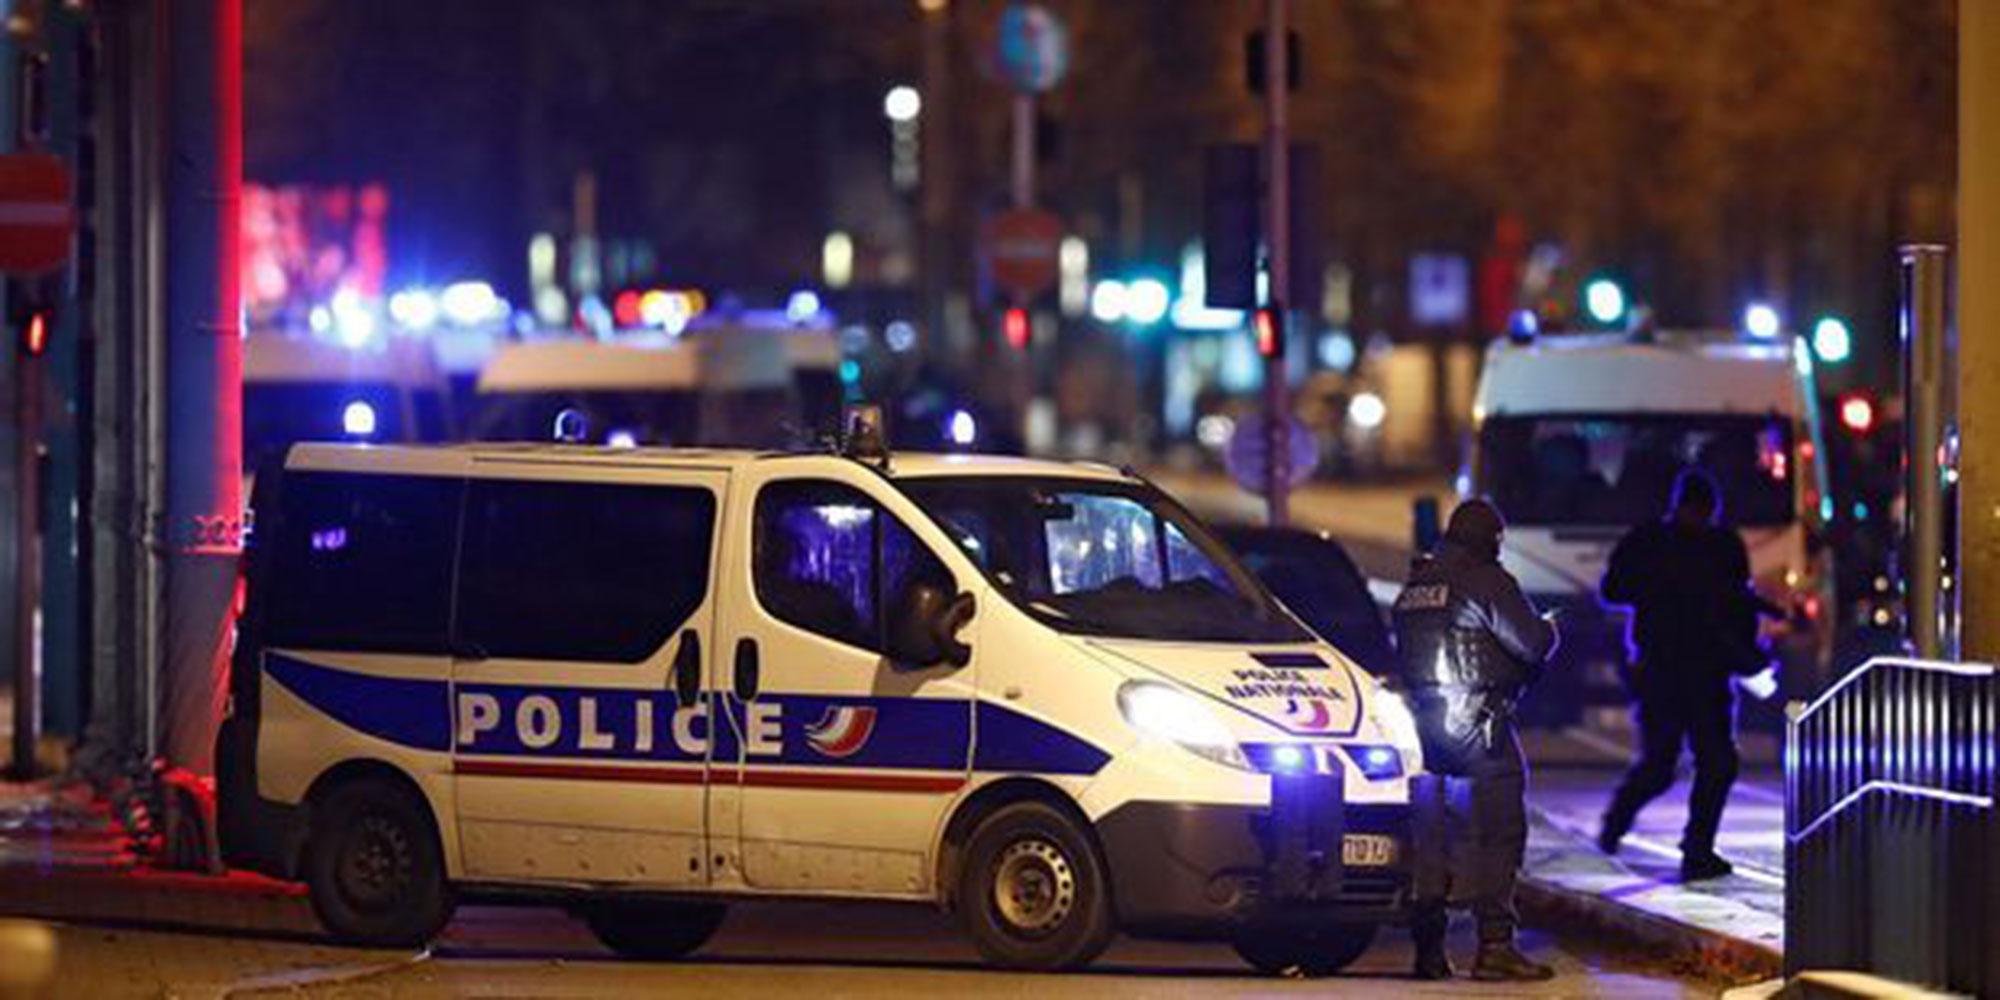 En France, la menace terroriste persiste